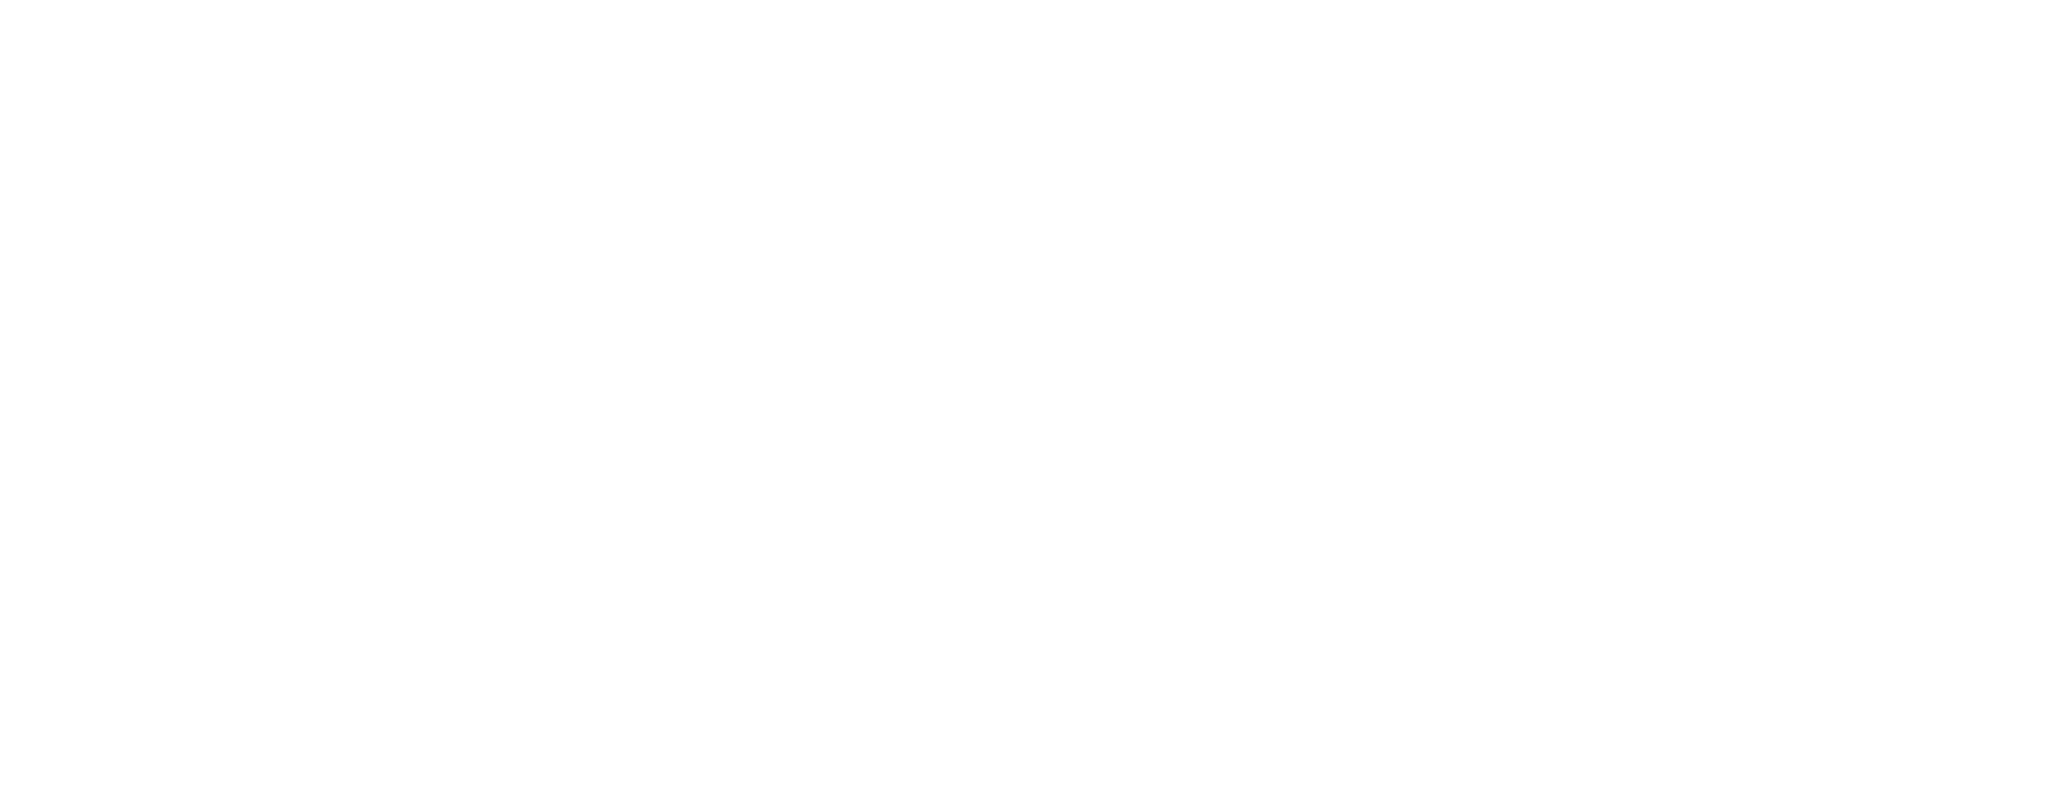 goldentulip_home_image